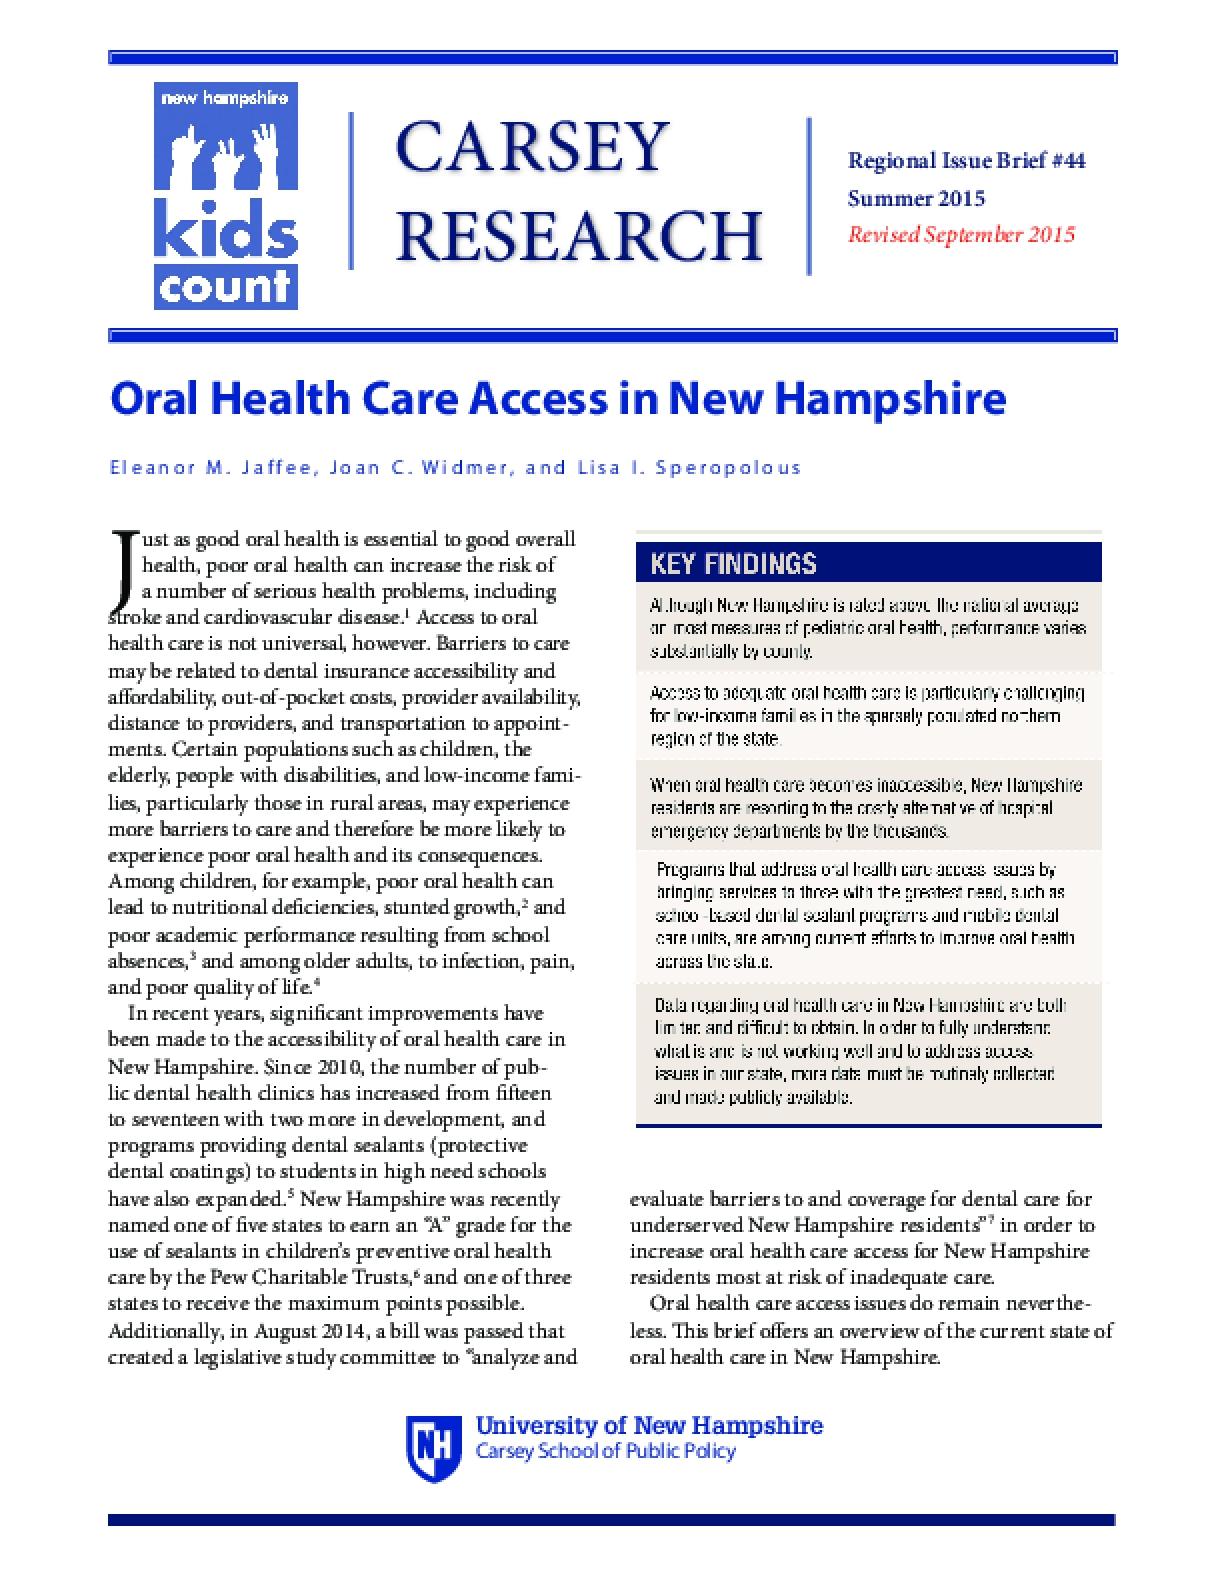 Oral Health Care Access in New Hampshire